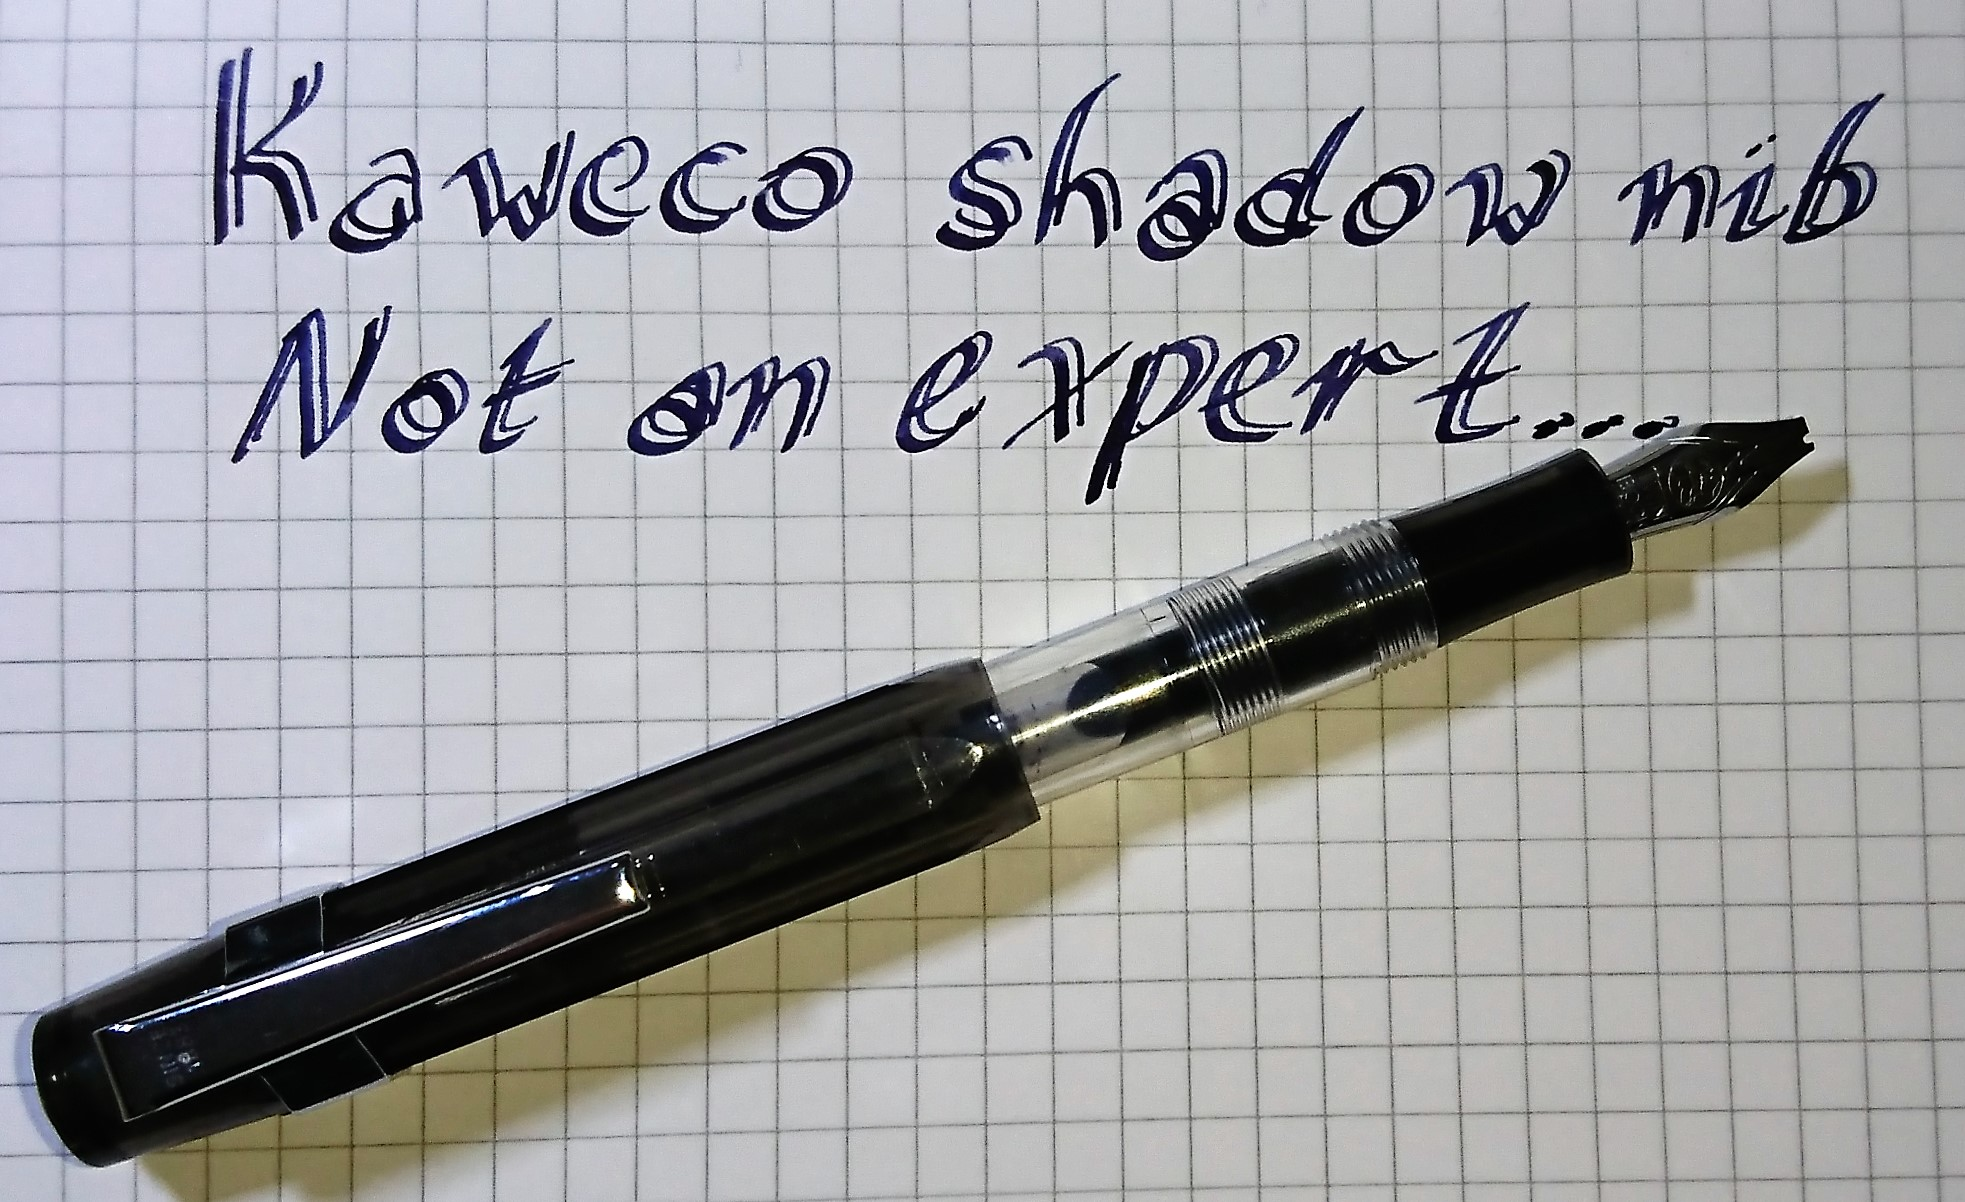 fpn_1499837636__kaweco_shadow.jpg